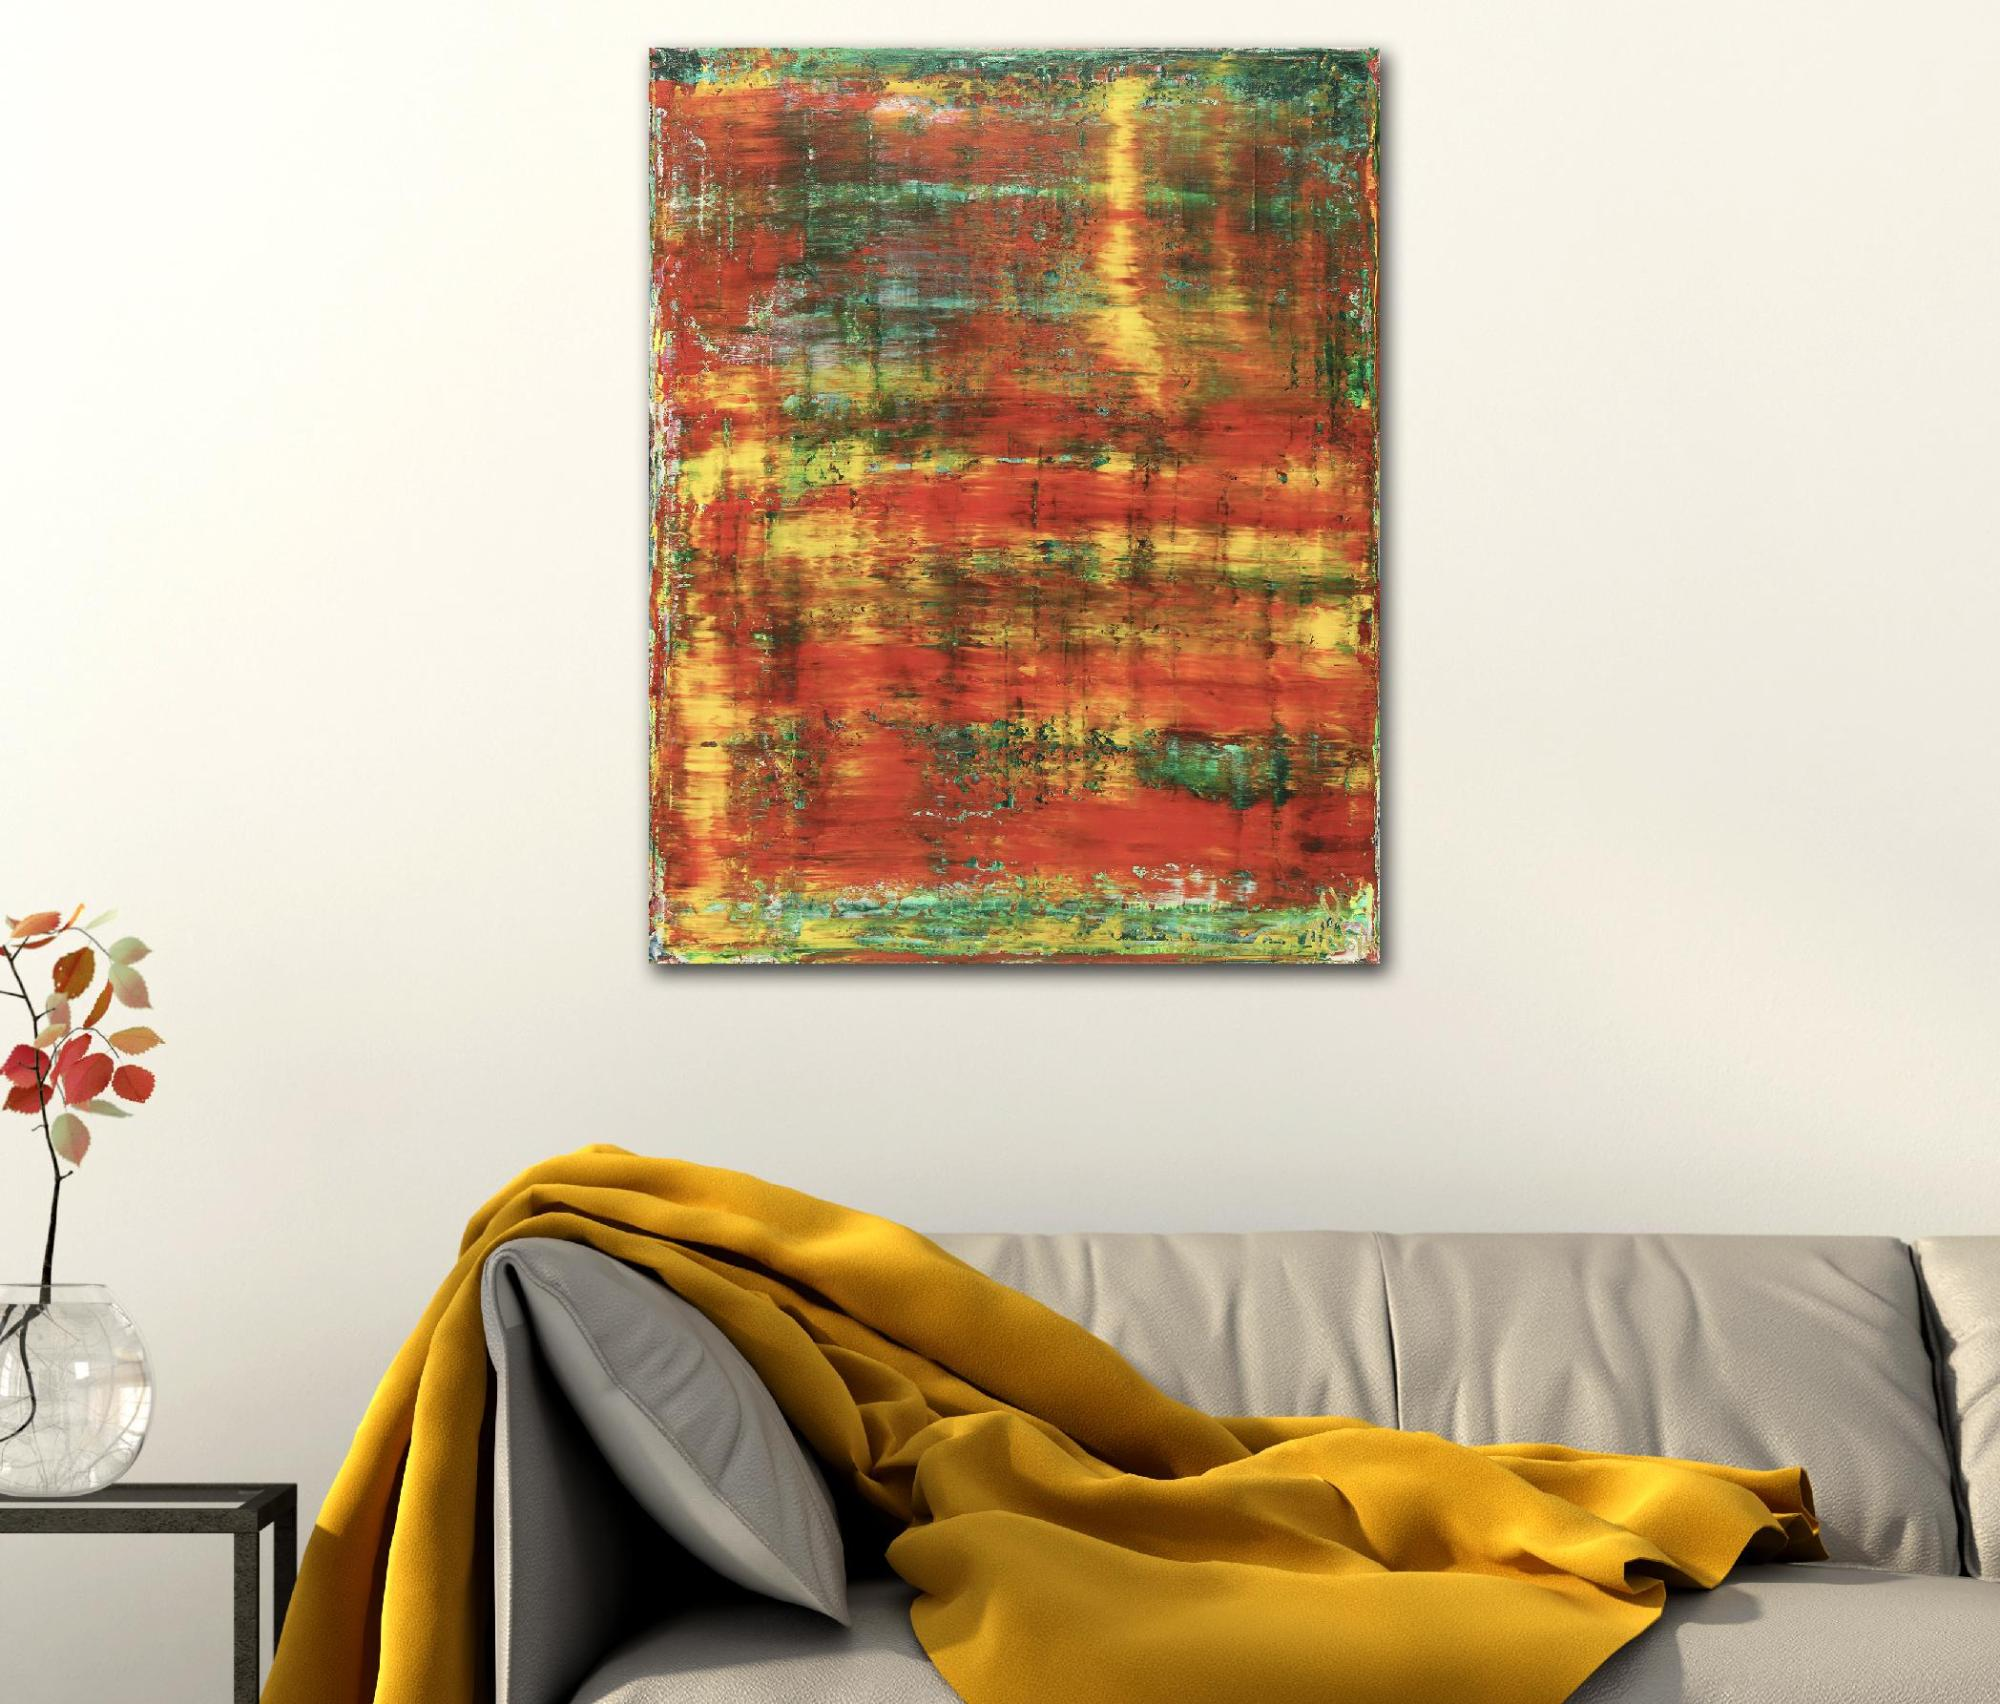 Room View - Rojo Infinito (Fiery Spectra) #1 (2020) by Nestor Toro - SOLD